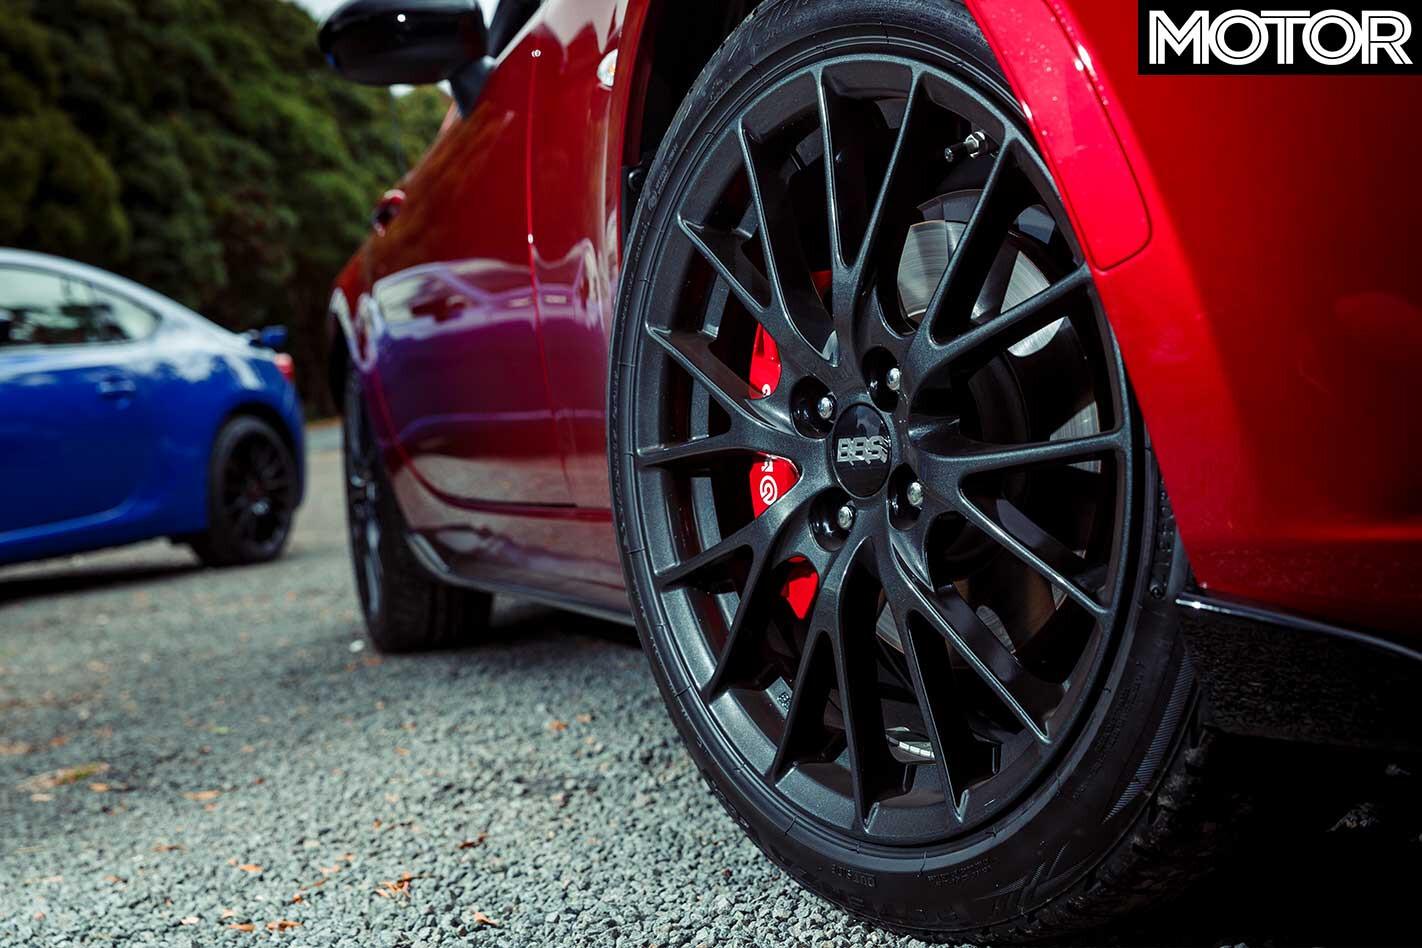 2018 Mazda Mx 5 Rf Le Bridgestone Tyres Review Jpg